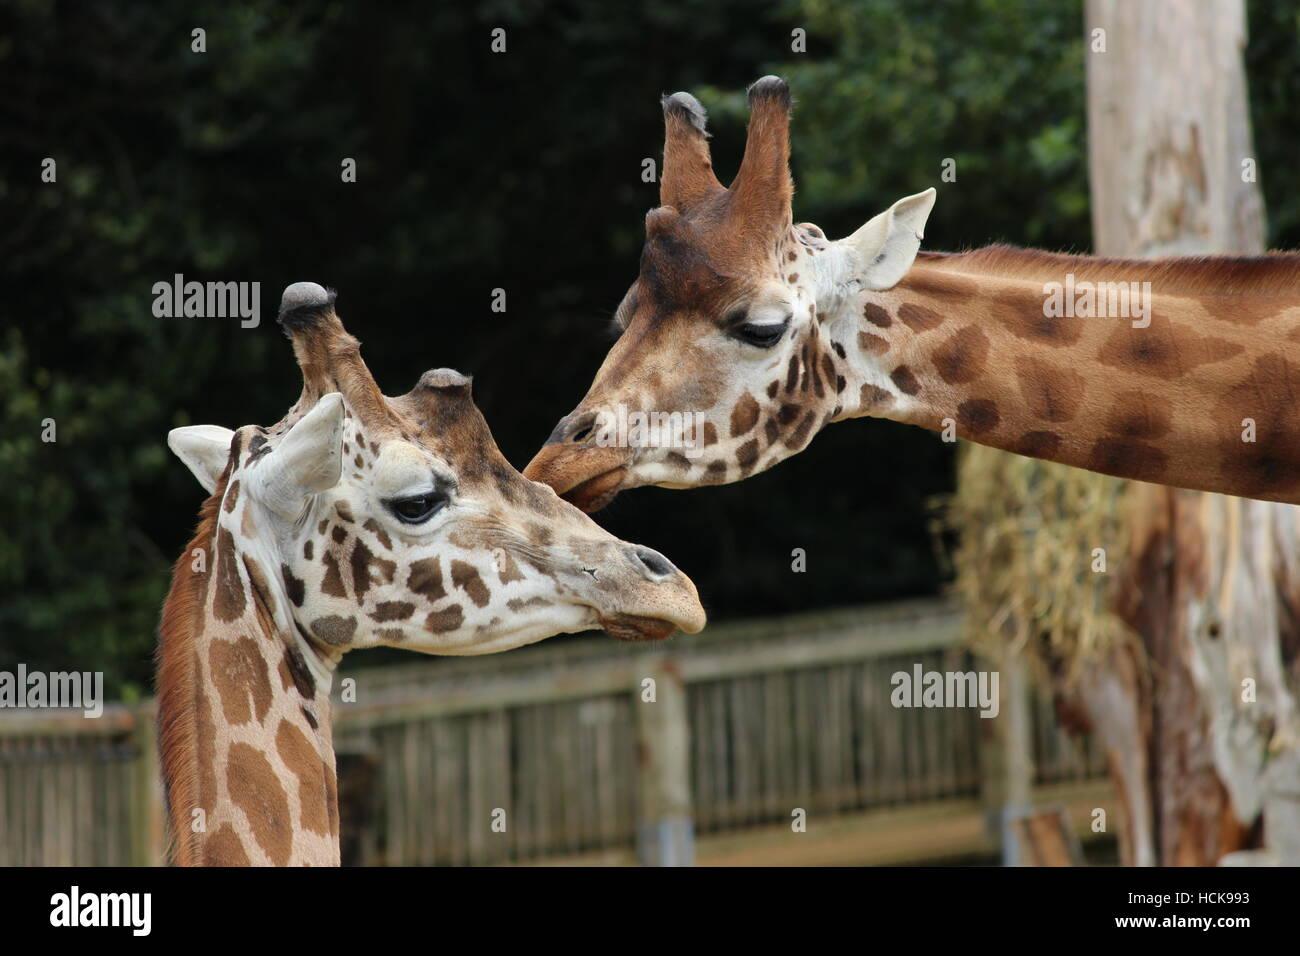 Mutter-Kind-Giraffen küssen Pflege kommunizierenden Porträt Kopfschüsse Kopf geschossen Cotswold Stockbild